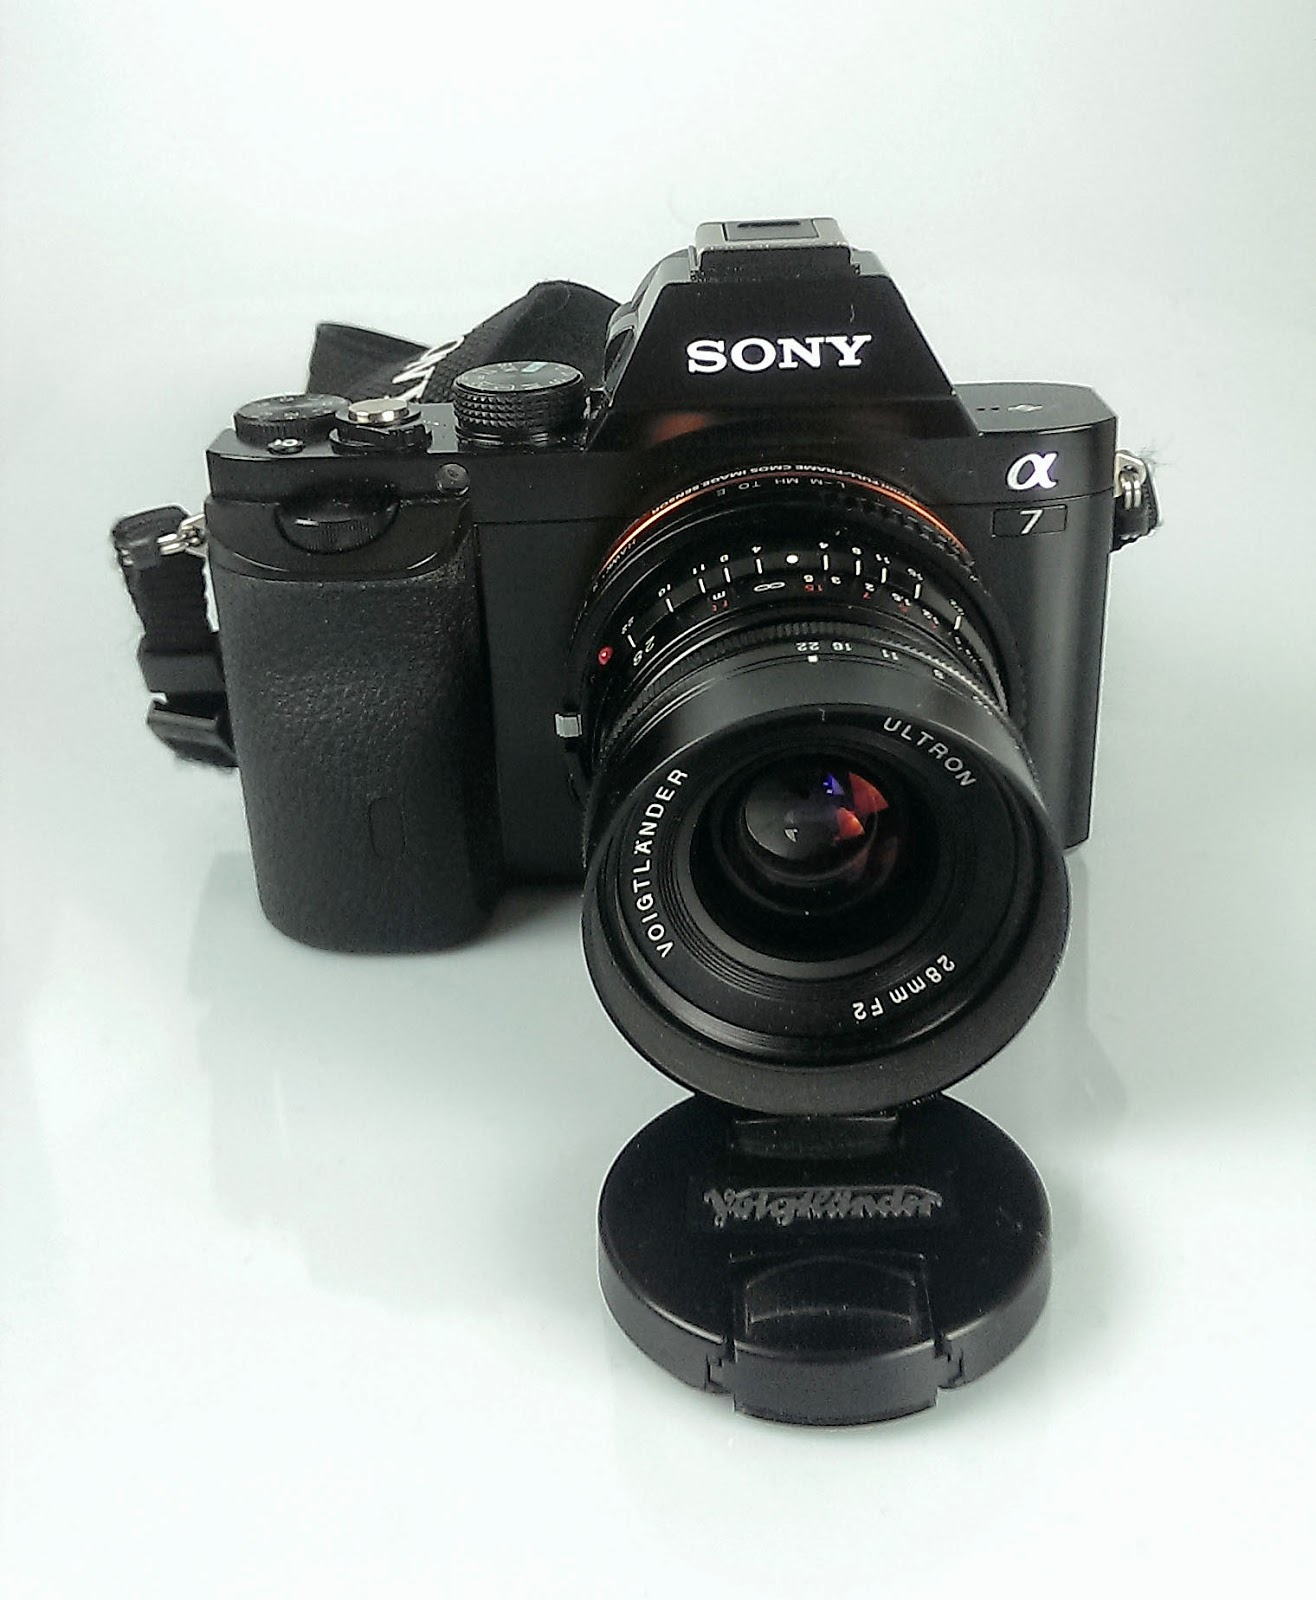 Sony A7 + Voigtlander 28mm Ultron f/2